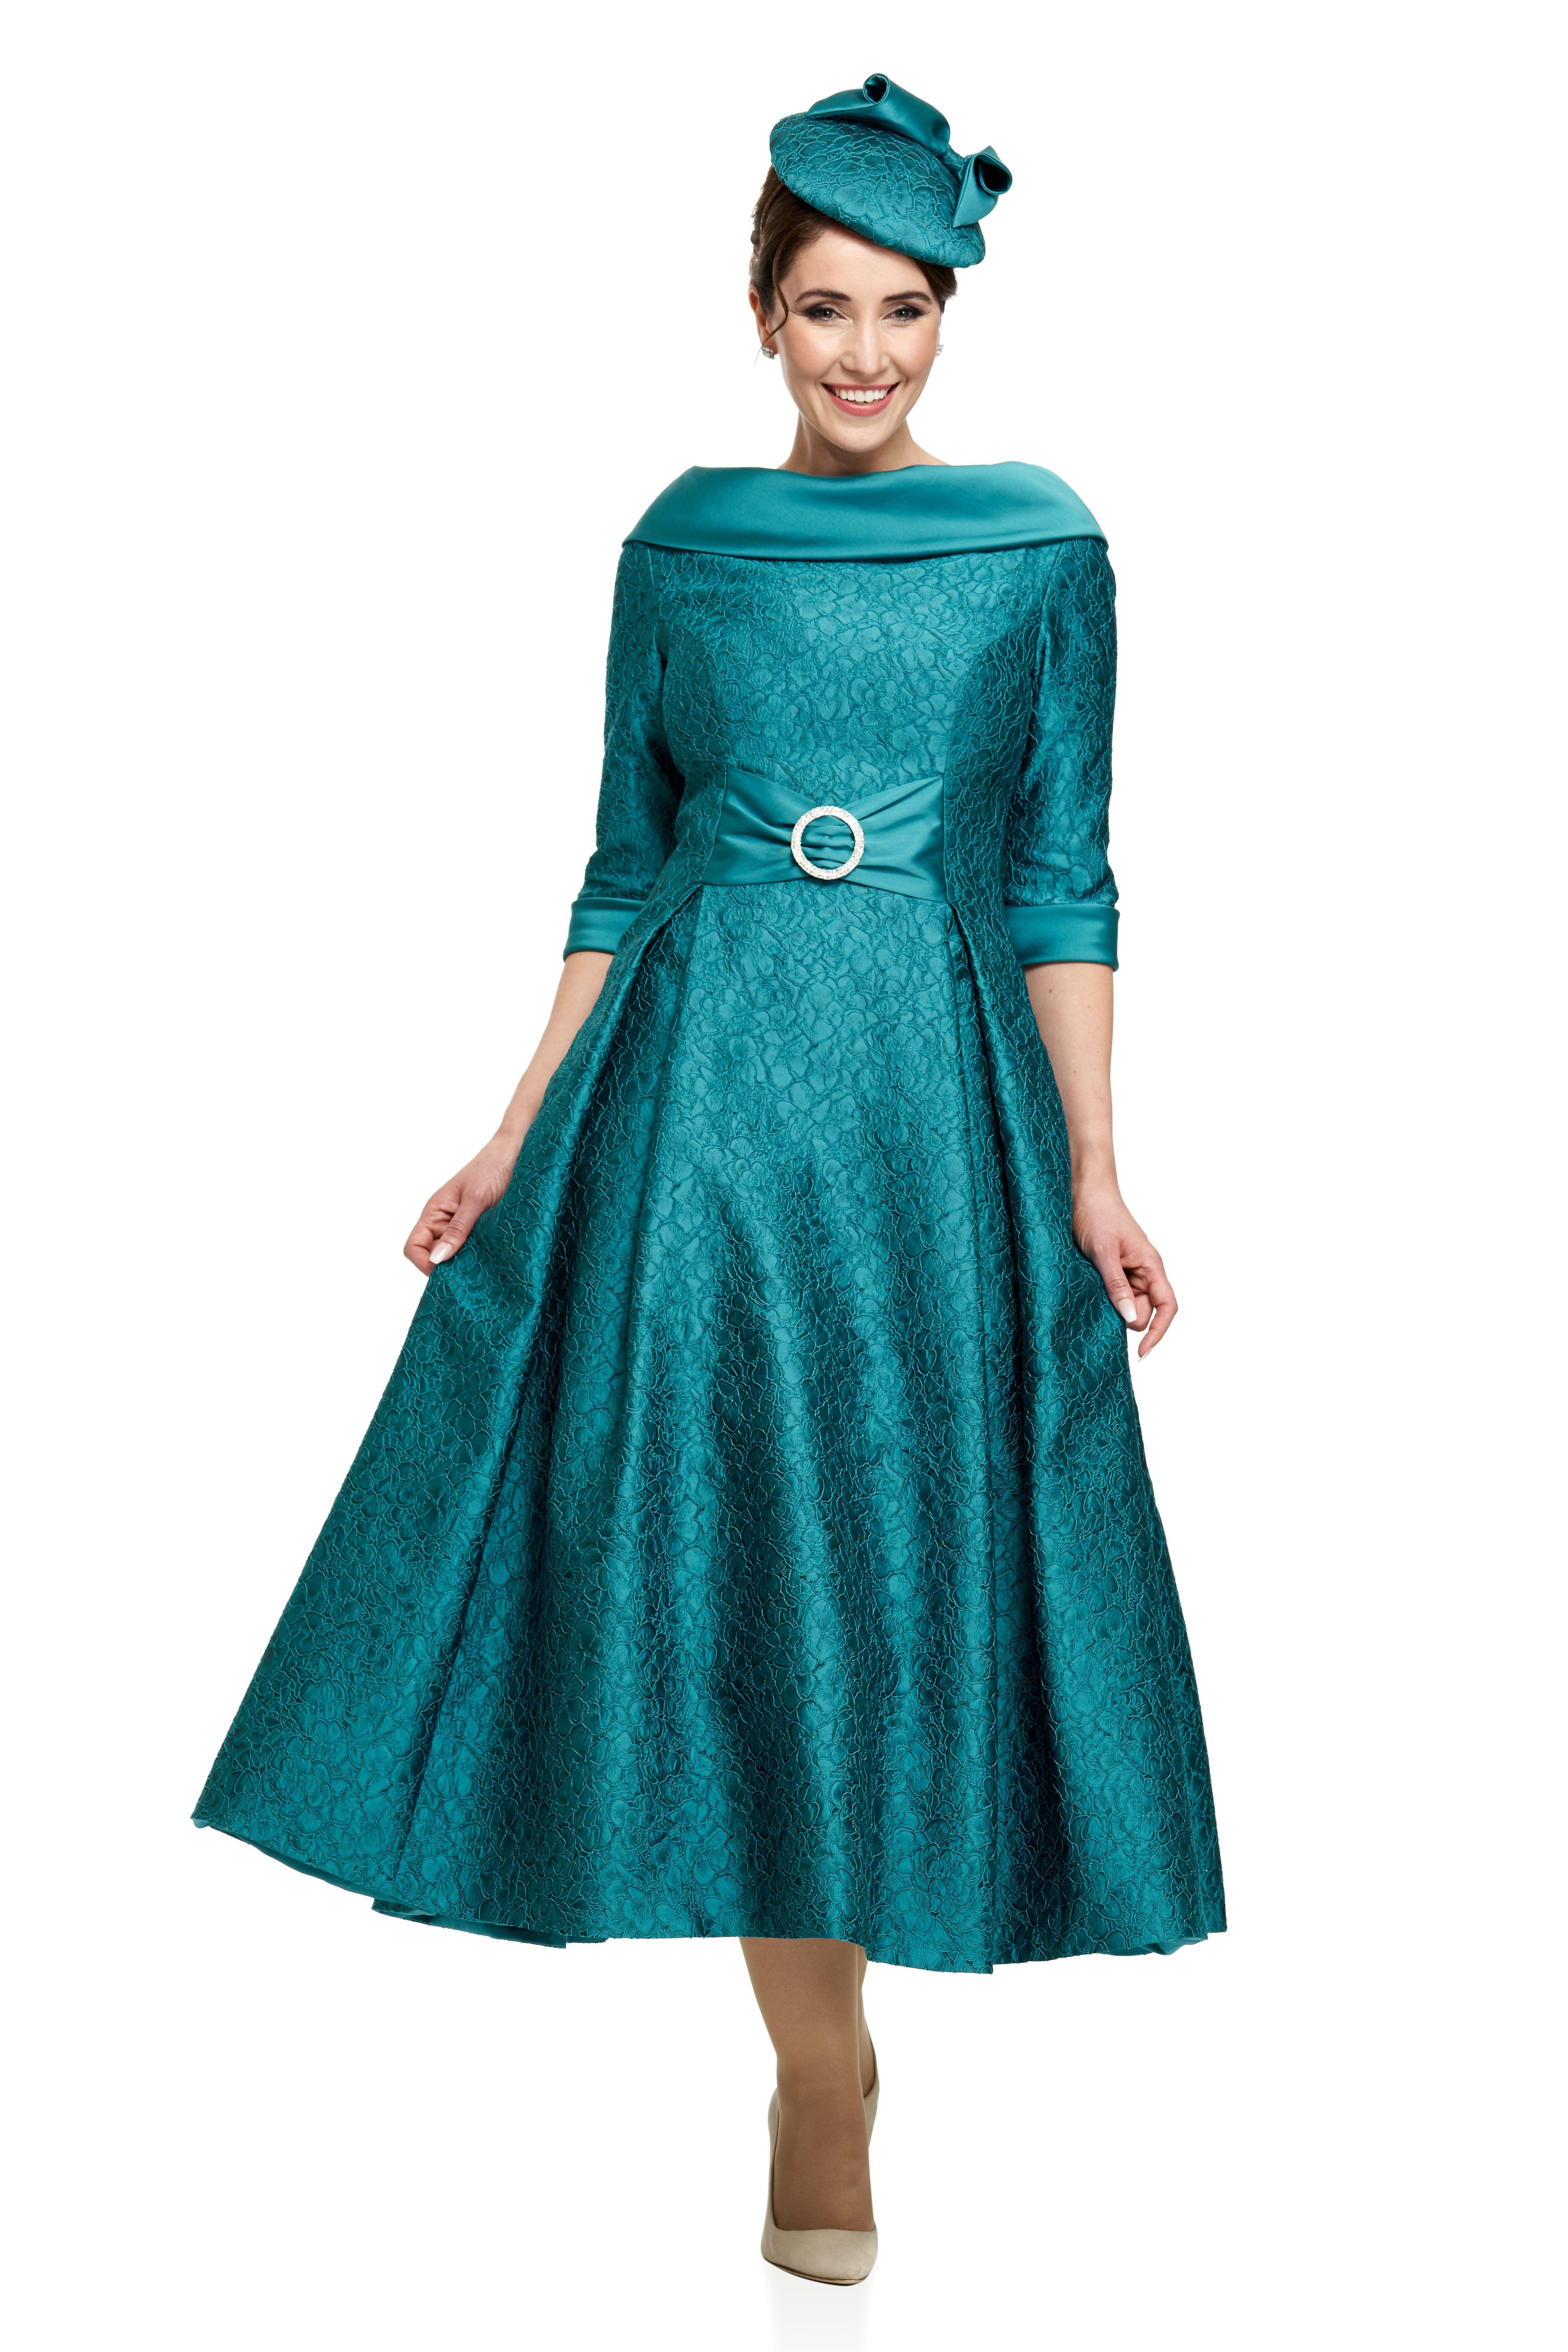 Bachelorette parties special occasion dresses classy simple, casual special occasion dresses, special occasion dress